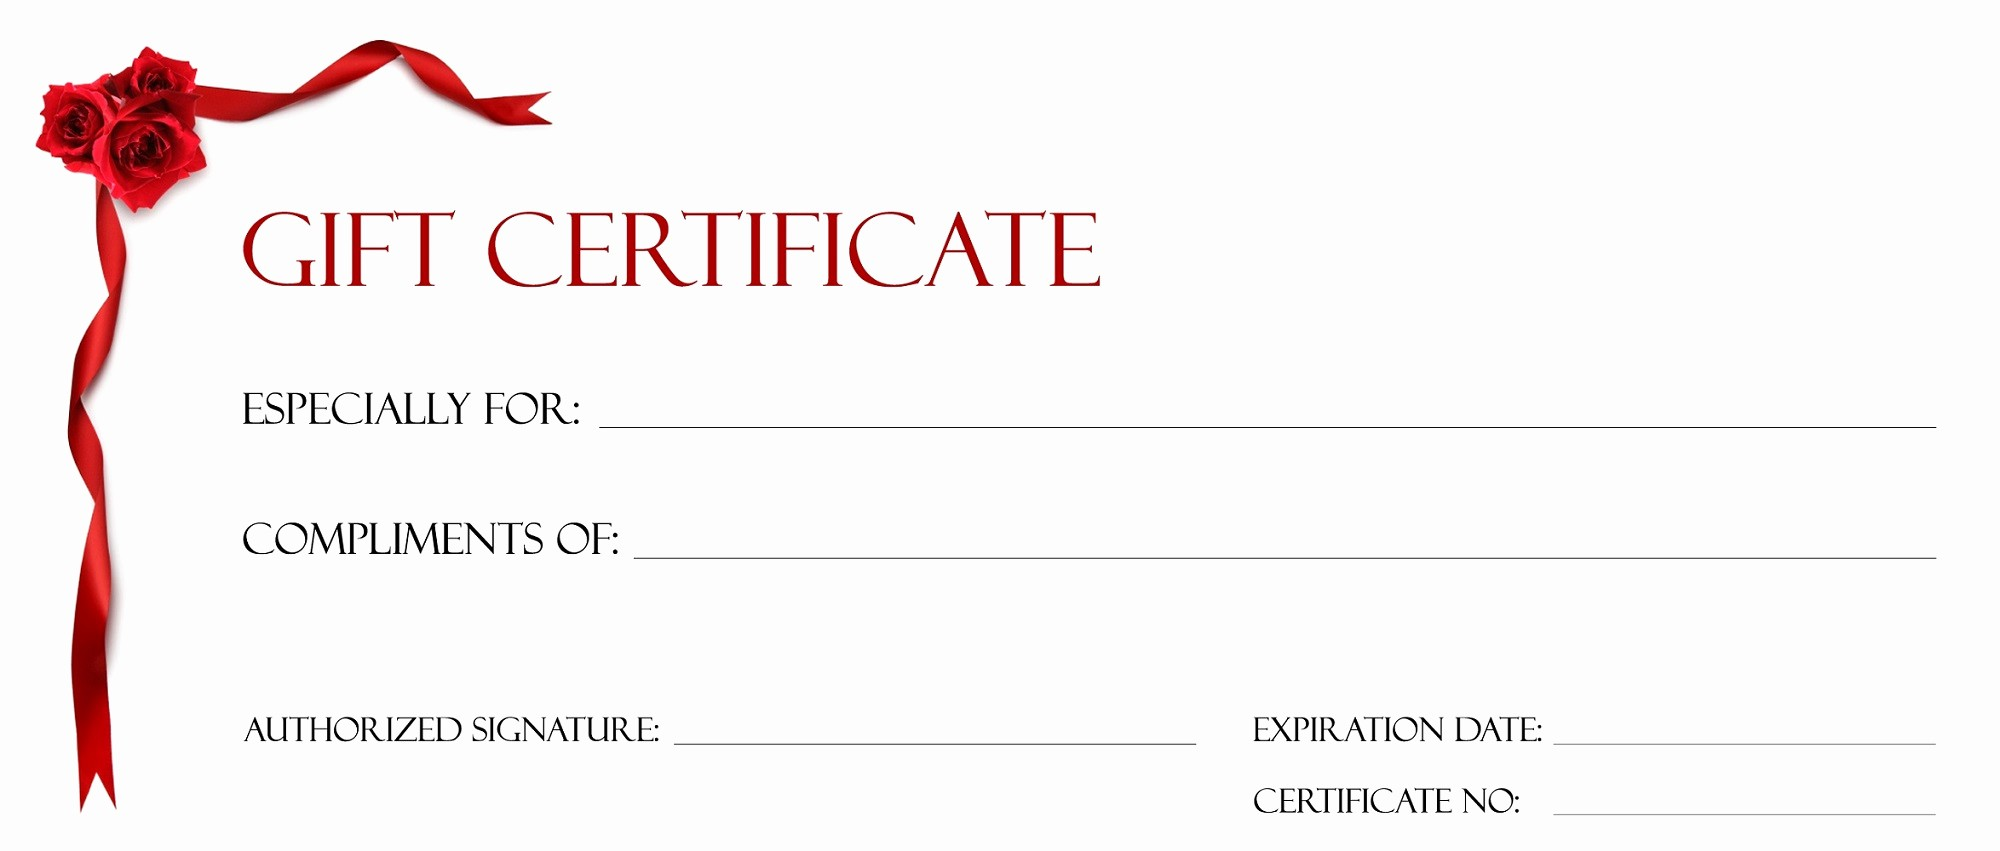 Print Gift Certificates Free Templates Luxury Gift Certificate Template for Kids Blanks